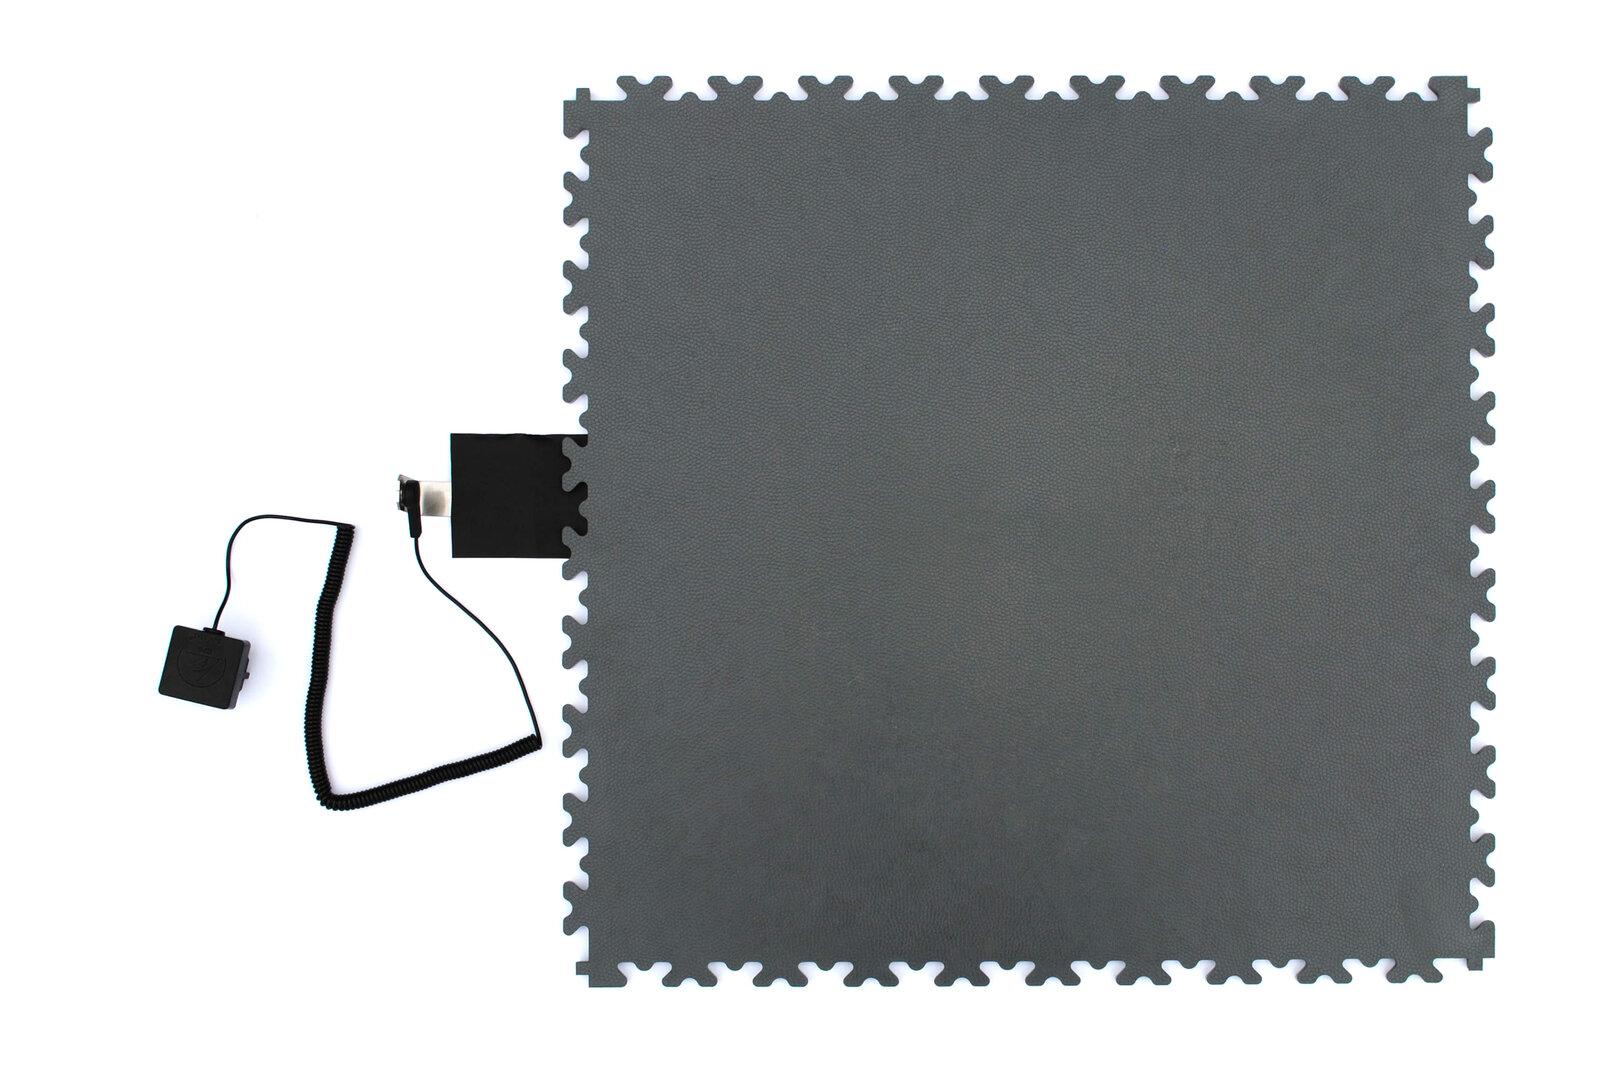 Šedá PVC vinylová zátěžová dlažba Fortelock Industry ESD - délka 51 cm, šířka 51 cm a výška 0,7 cm